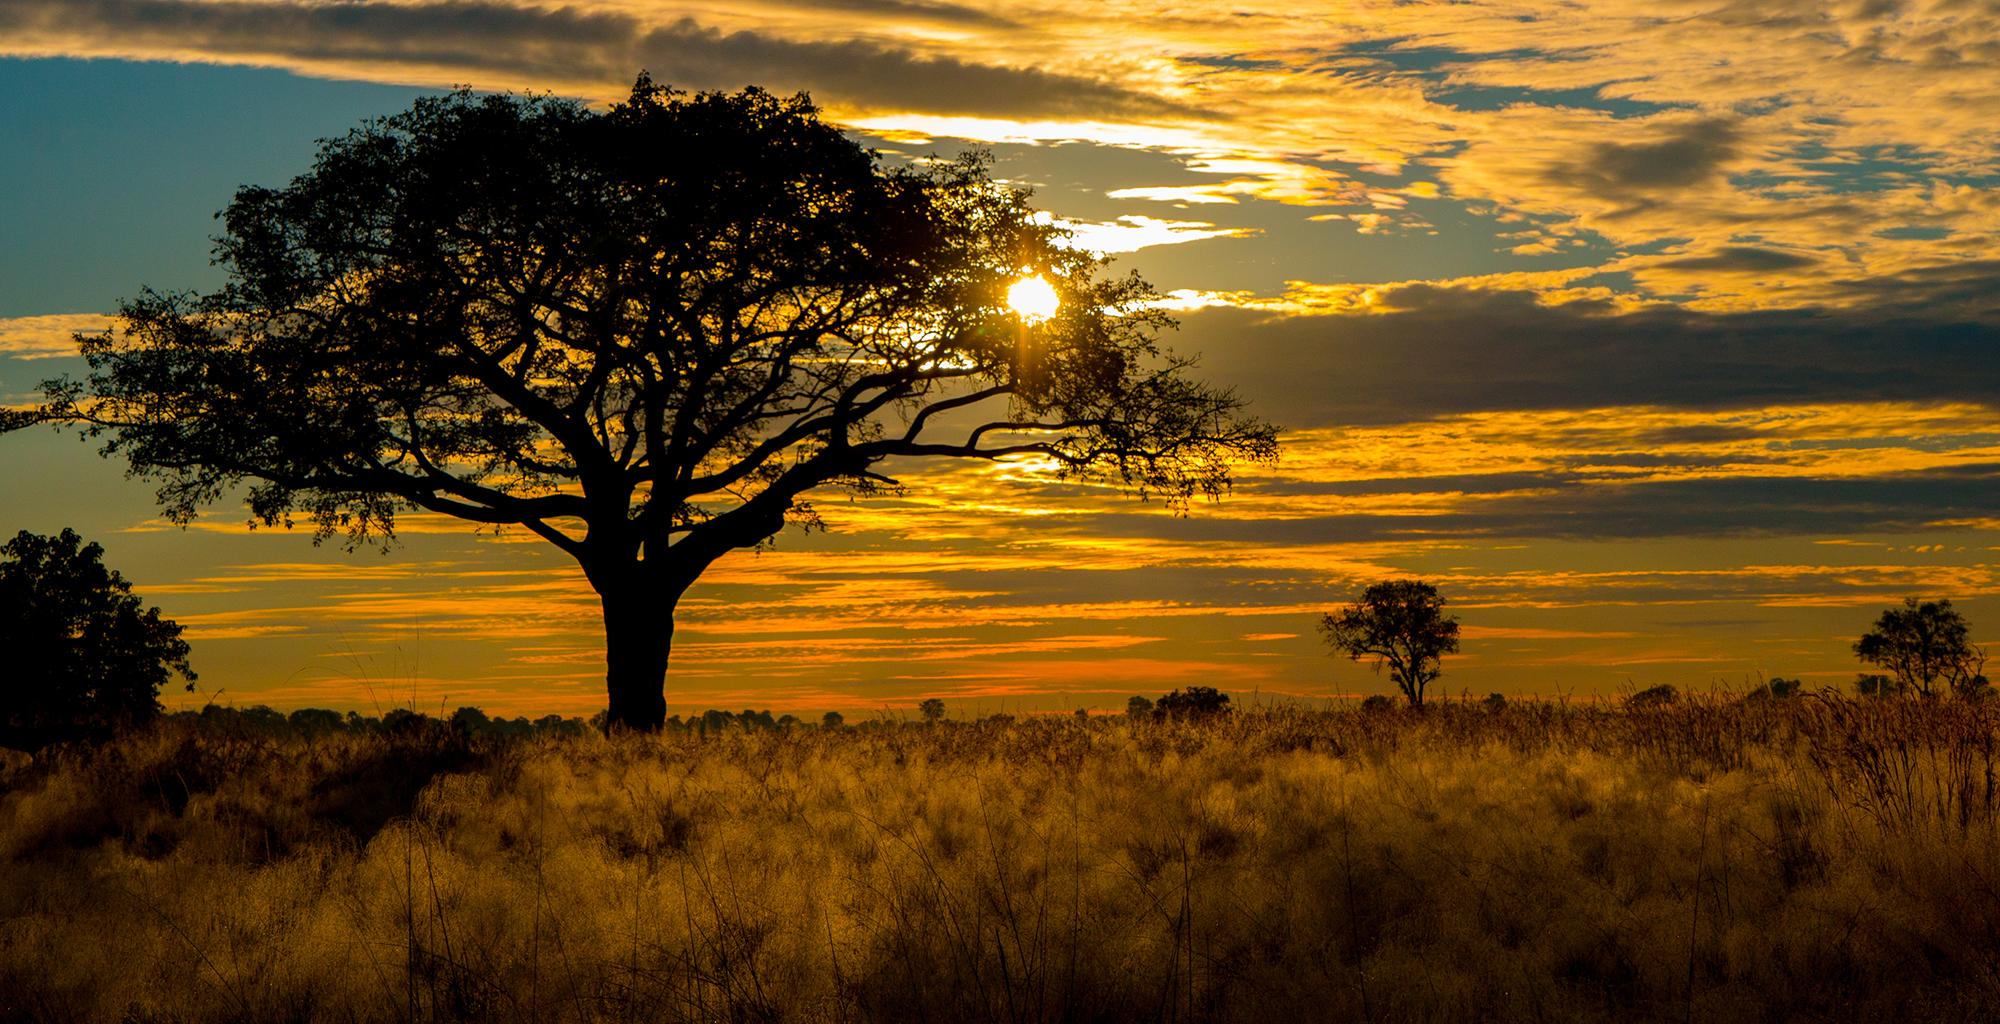 Botswana-Okavango-Delta-Landscape-Sunset